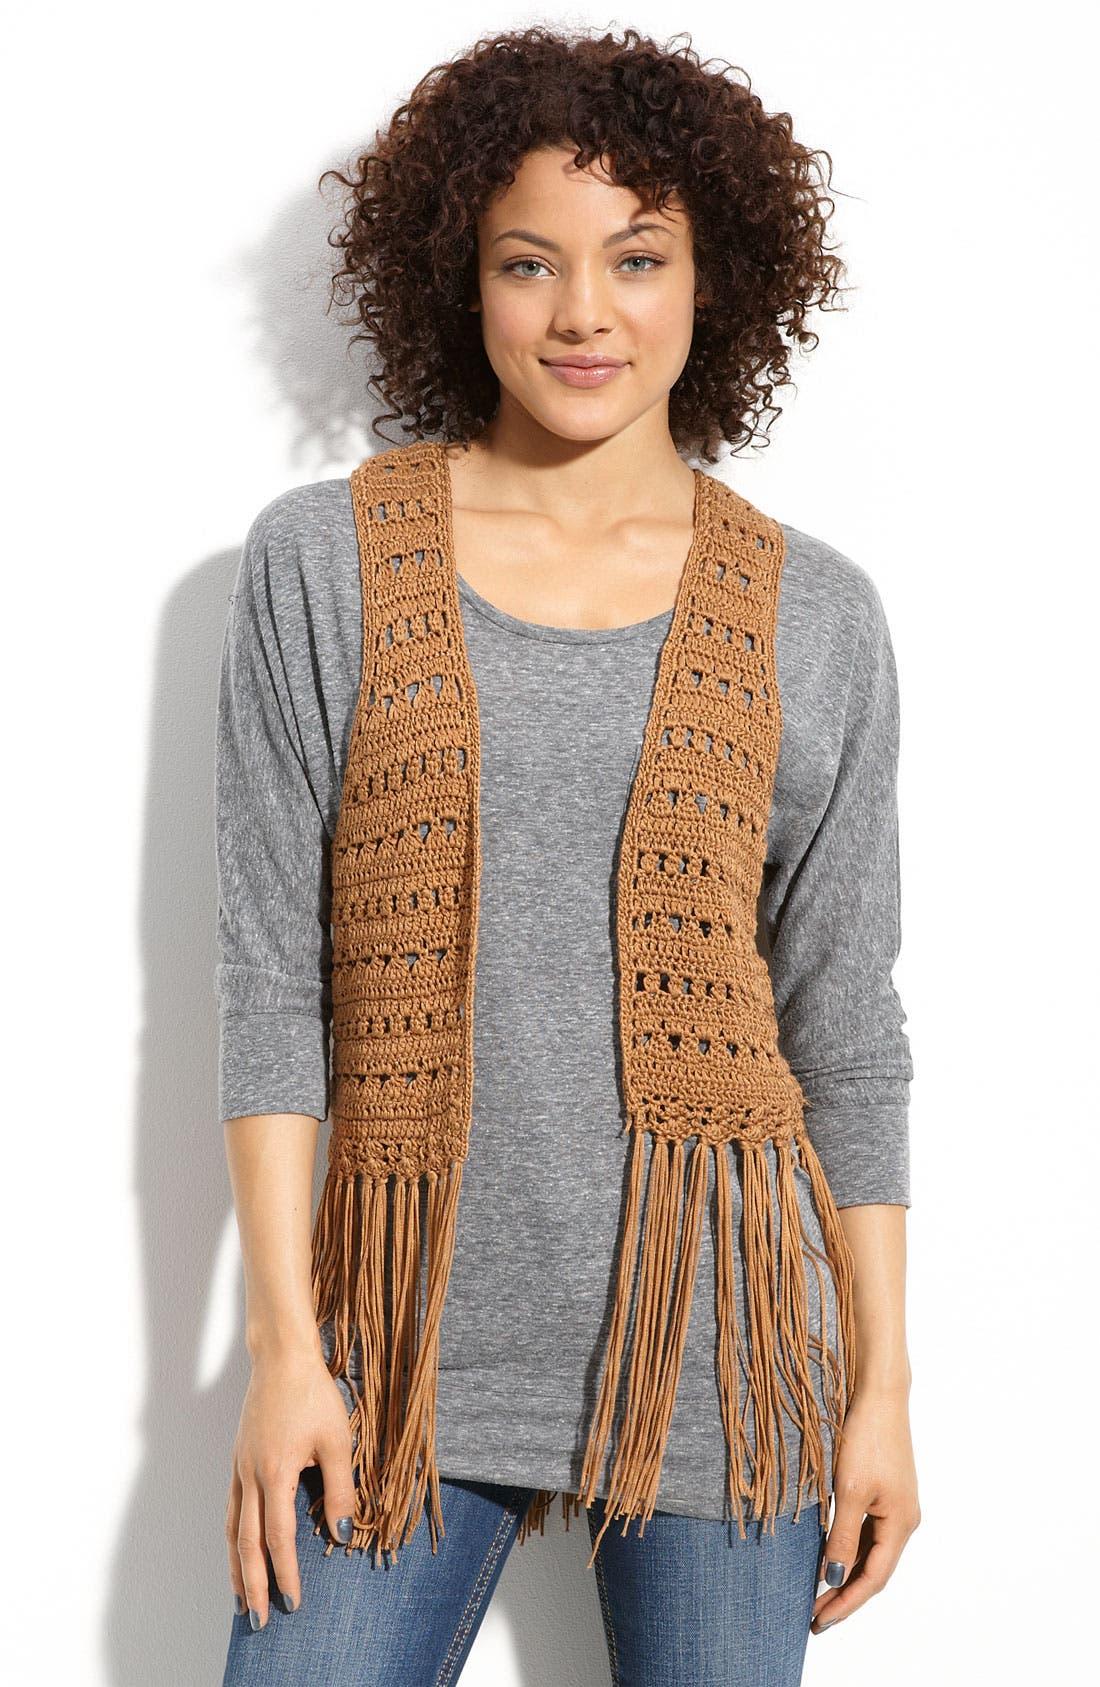 Alternate Image 1 Selected - WallpapHer Fringed Vest (Juniors)